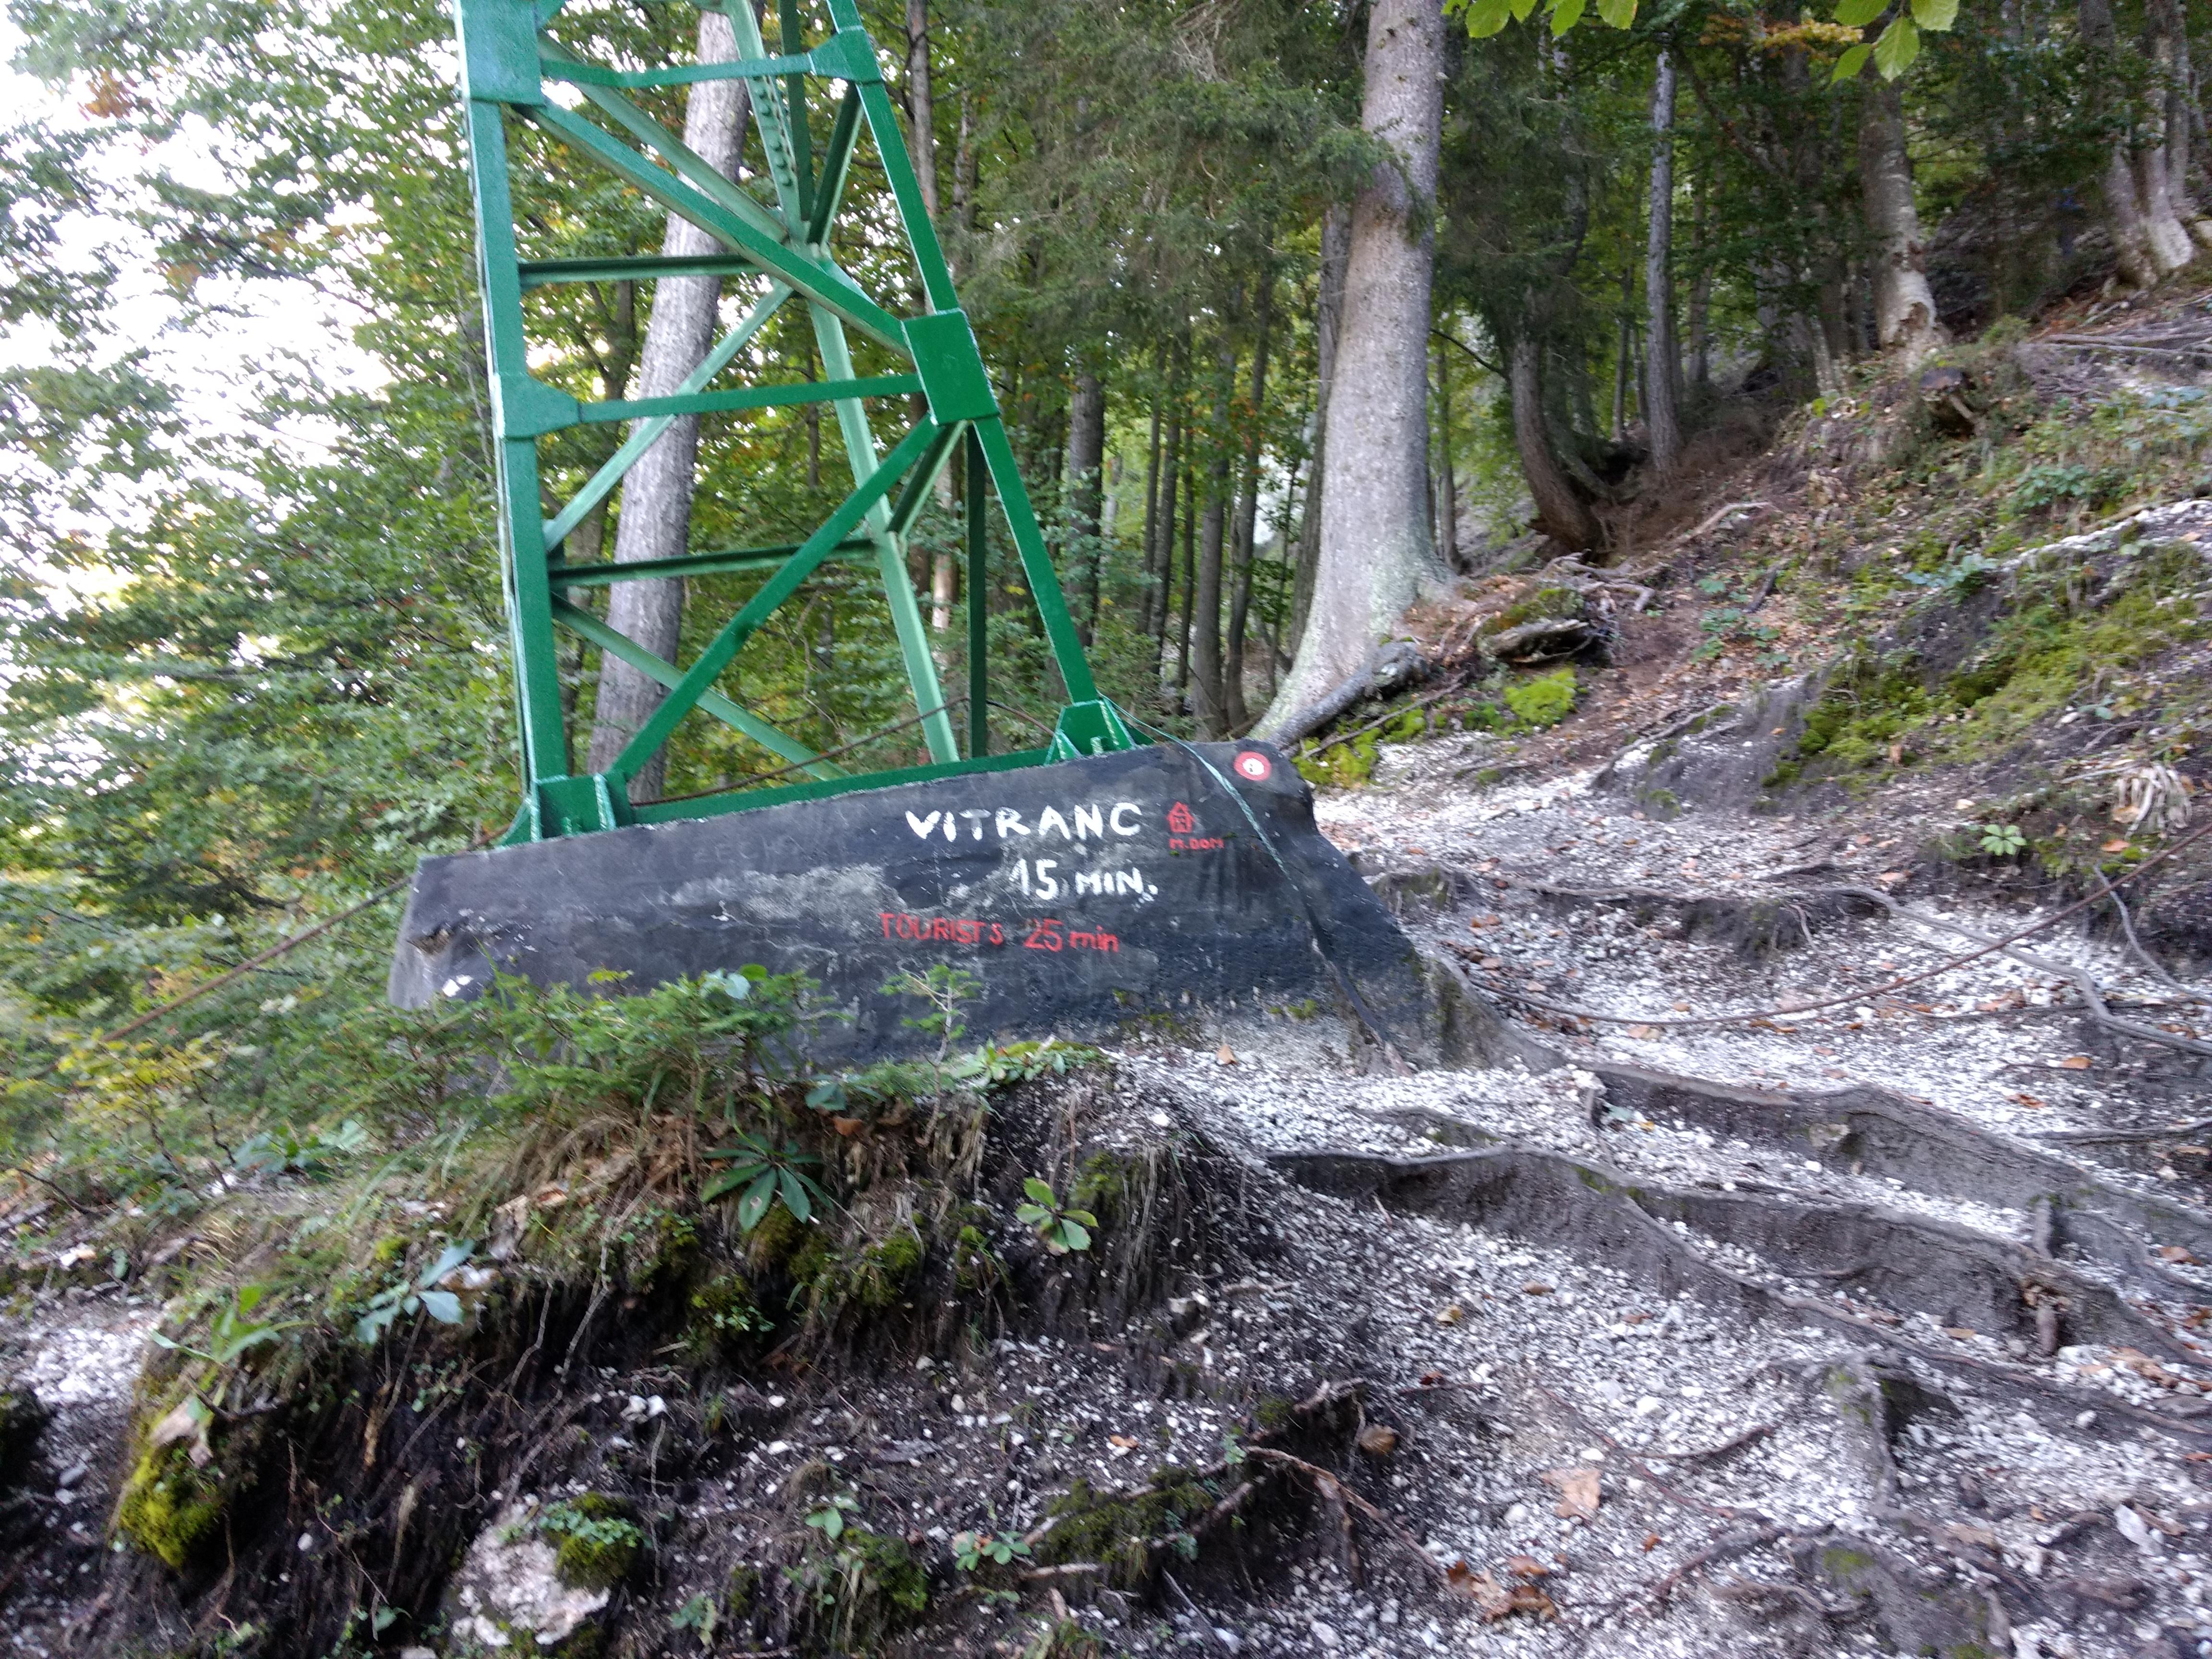 Sign to Vitranc